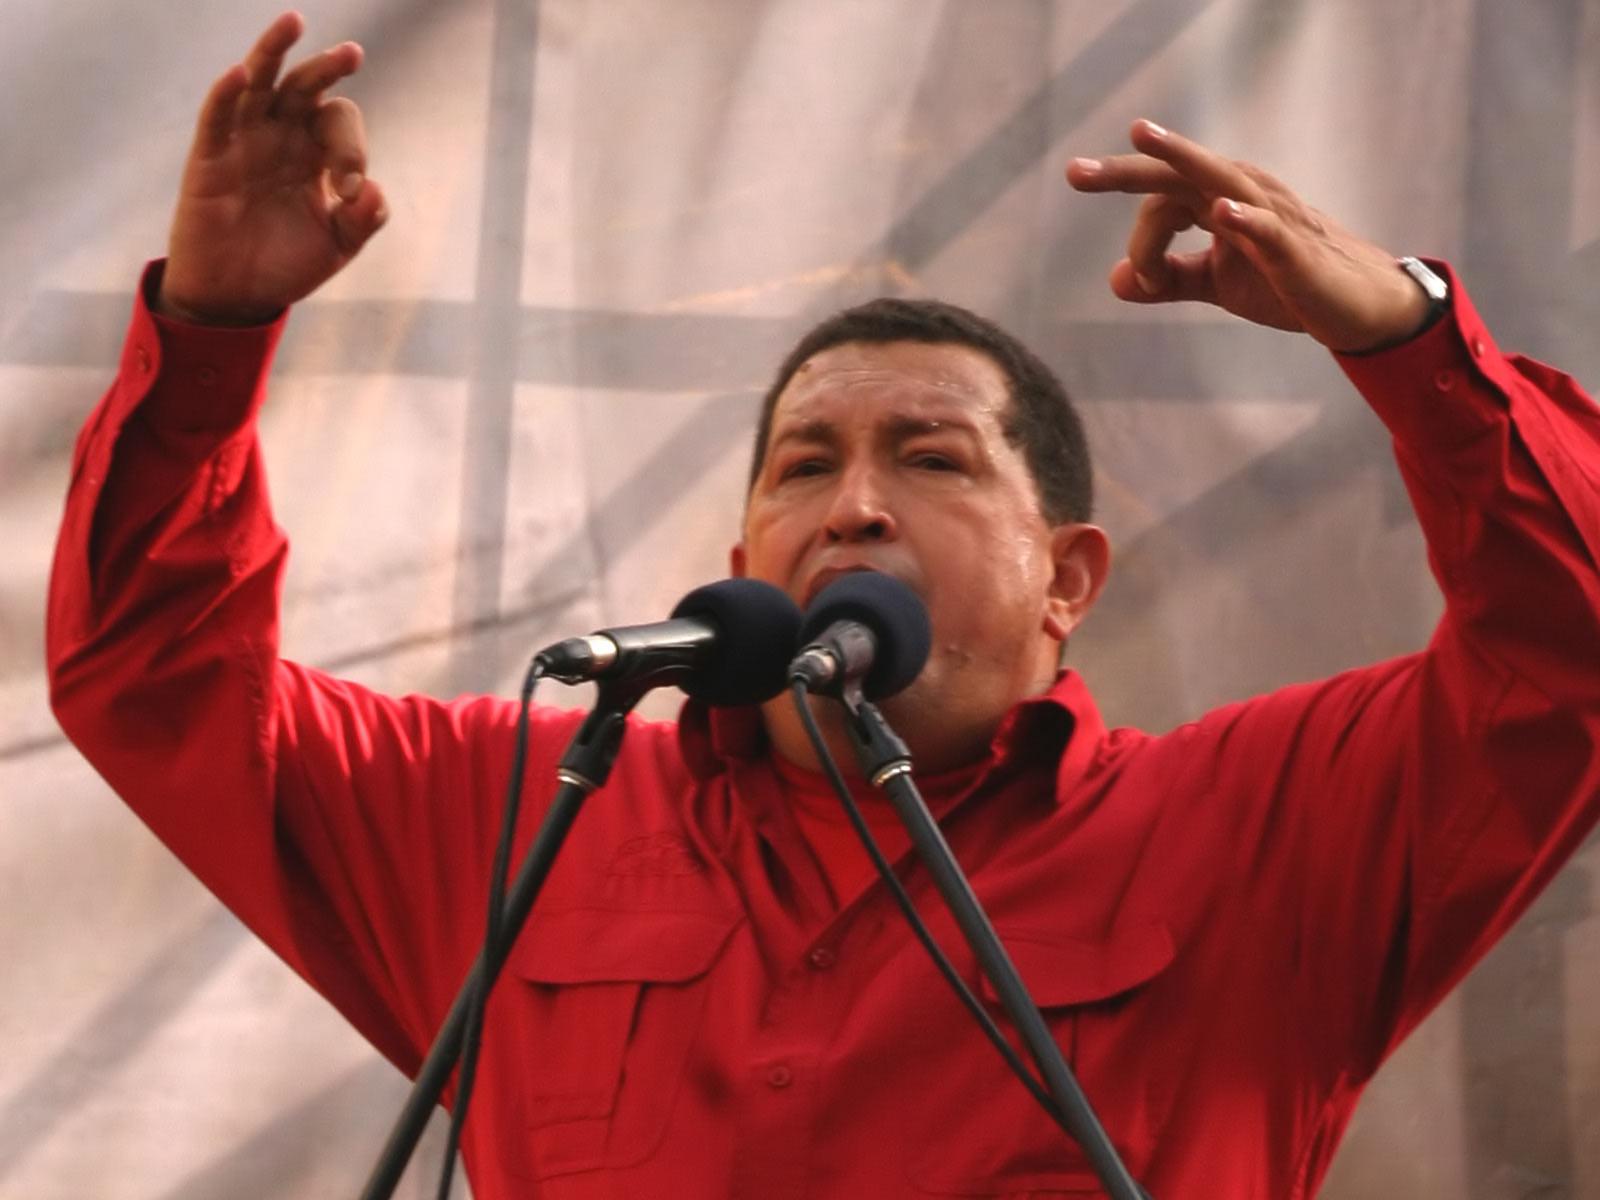 http://www.zastavki.com/pictures/1600x1200/2008/Men_Politics_Hugo_Chavez_010908_.jpg